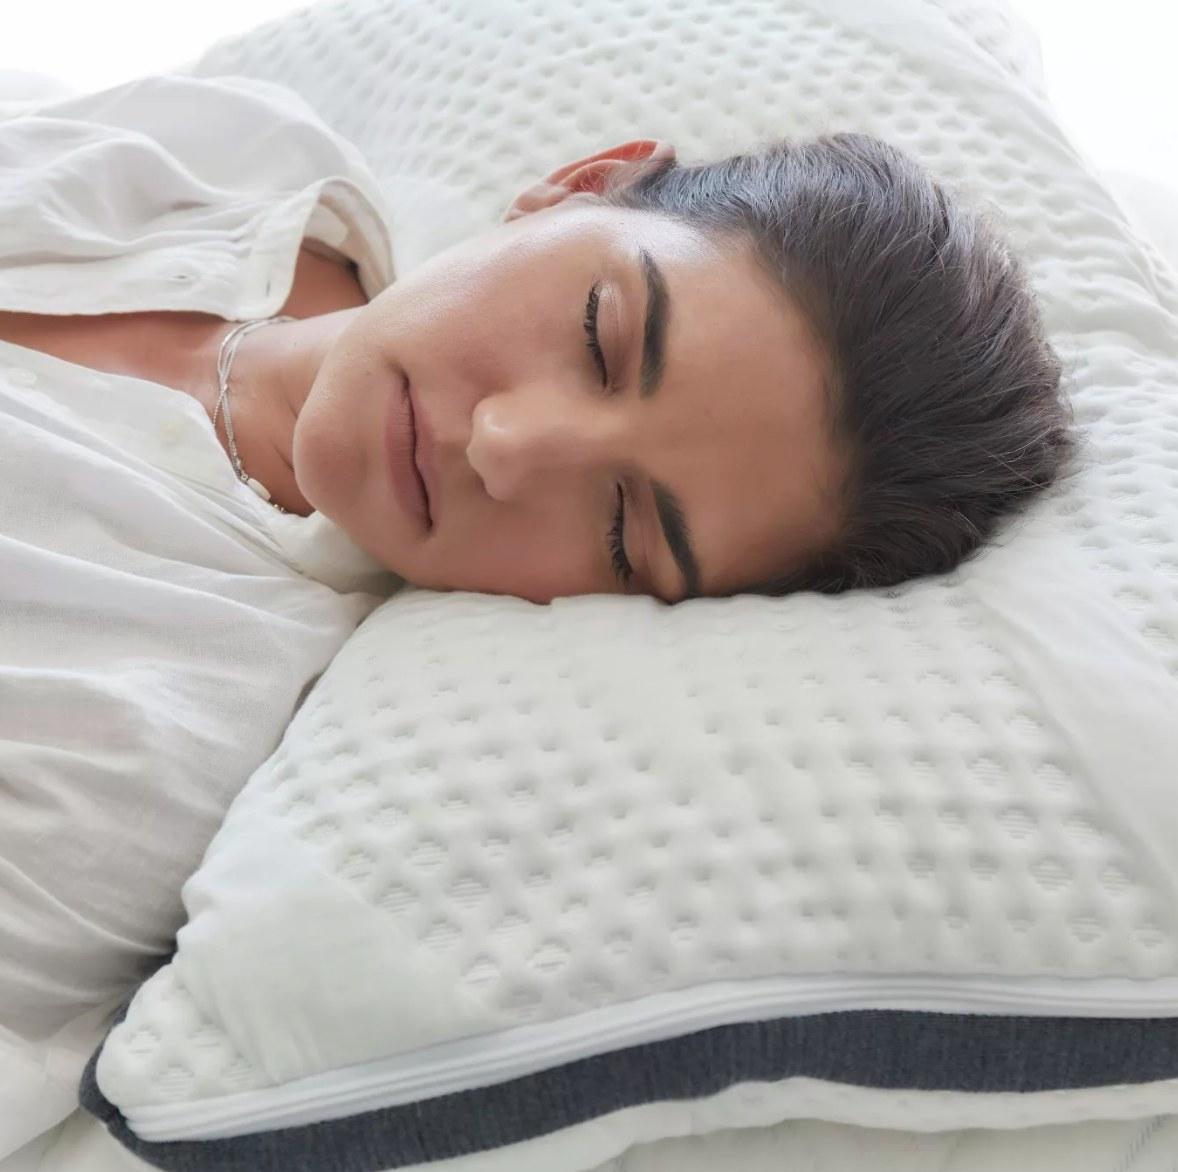 Model sleeping on the textured white memory foam pillow